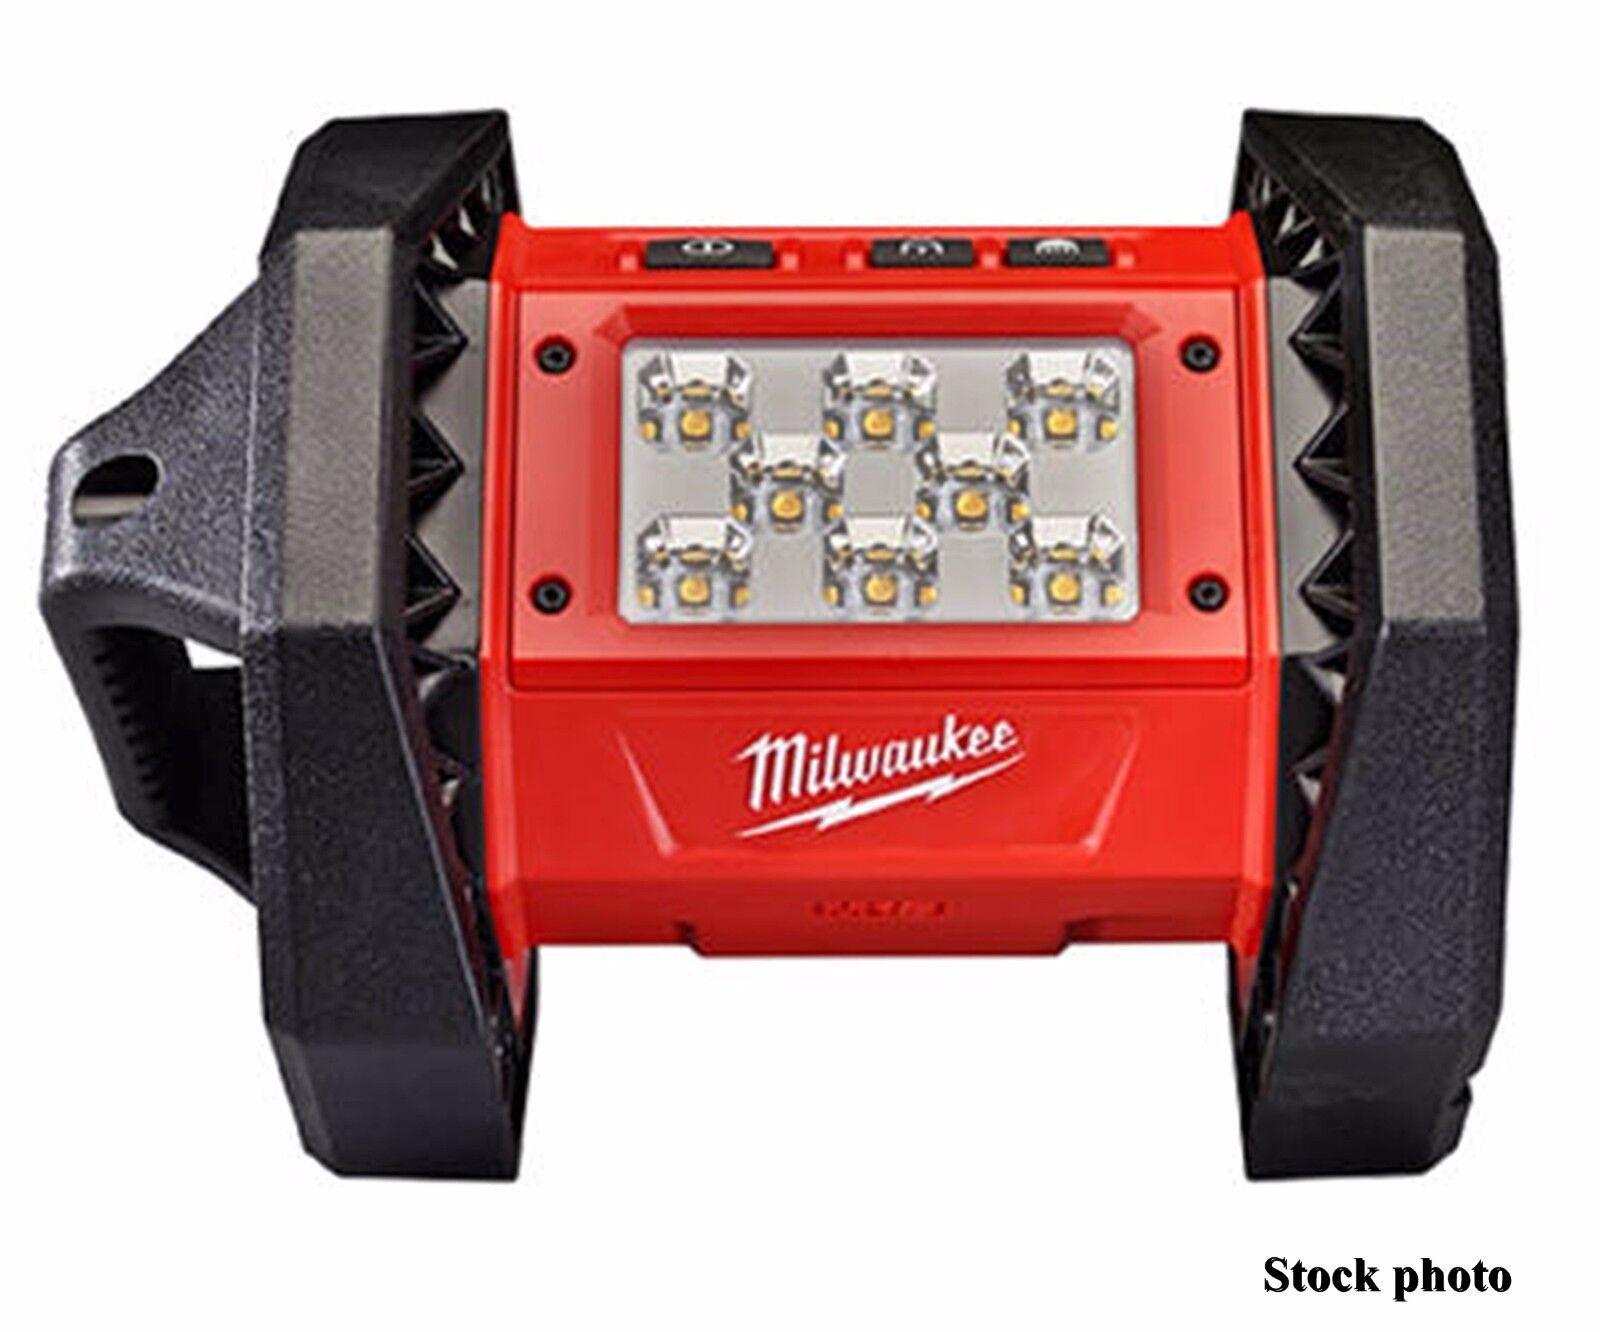 Milwaukee 2361-20 M18 LED Worklight Cordless 18 Volt Bare Tool Only 1500 Lumen